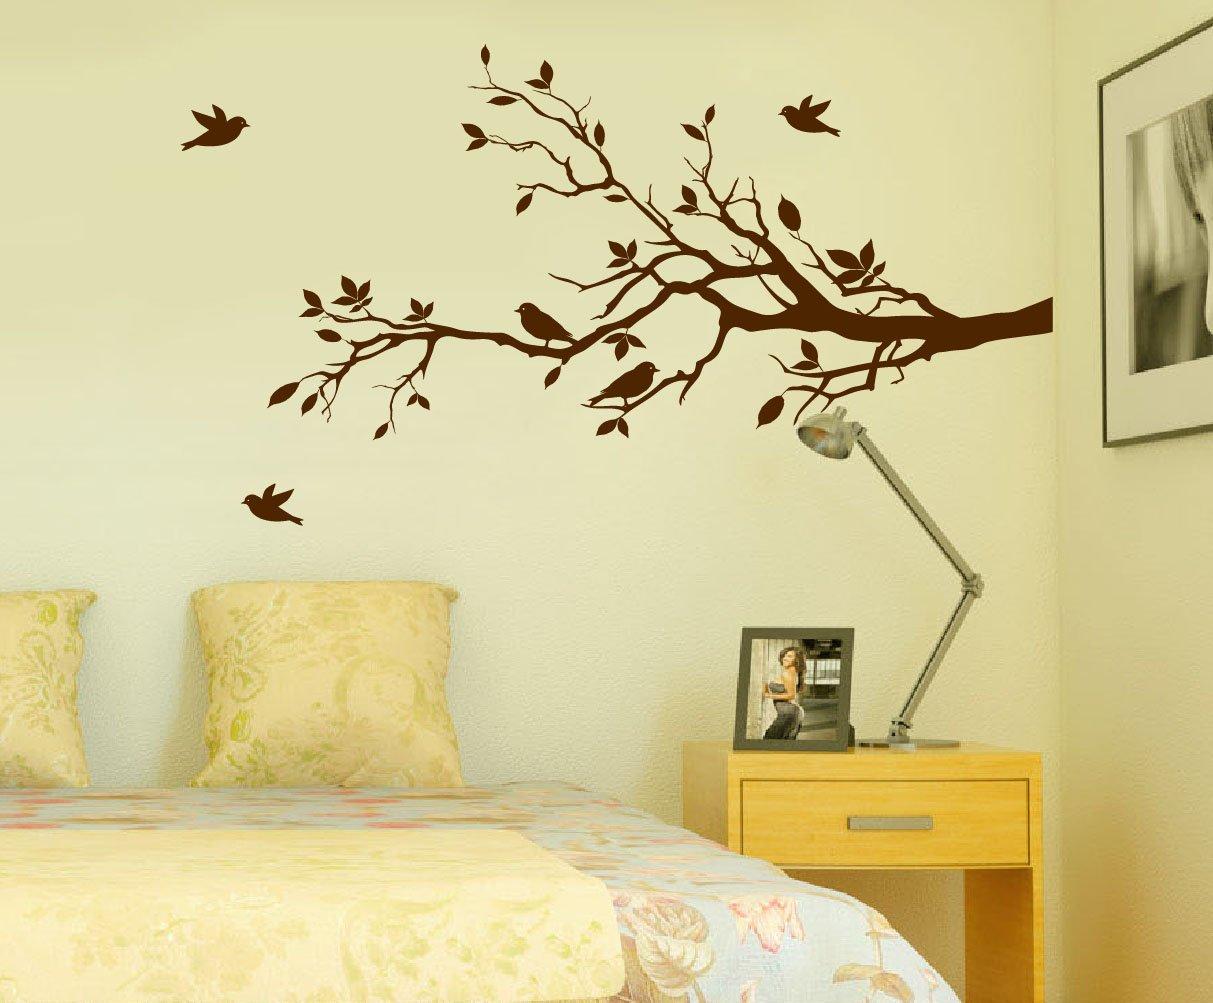 Amazon.com: Tree Branches Wall Decal Love Birds Vinyl Sticker ...